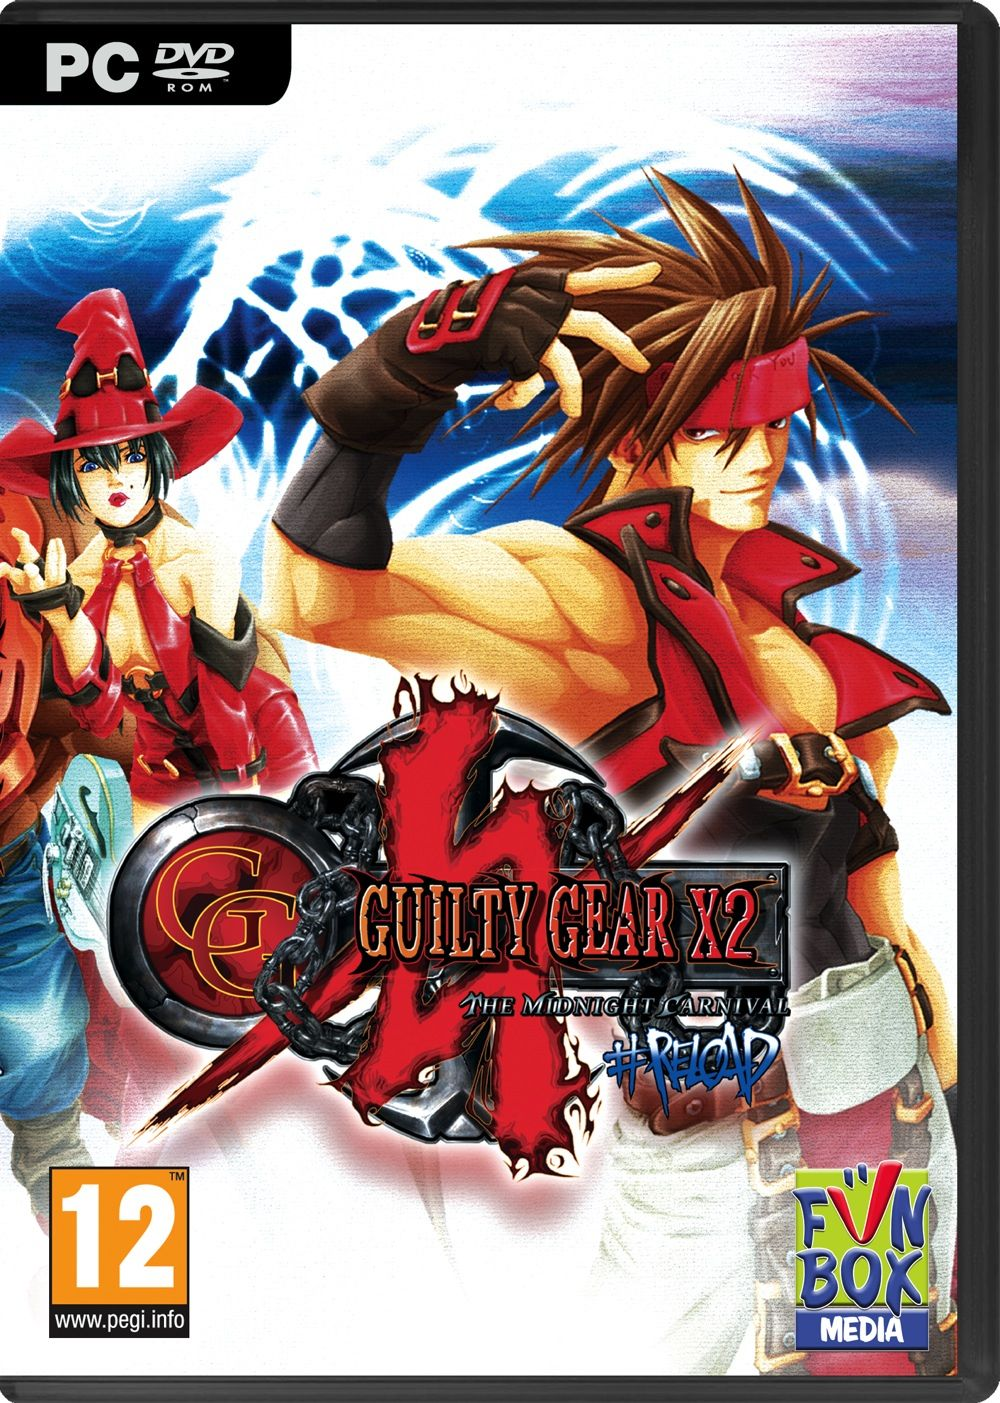 Guilty Gear X2 Reload The Midnight Carnival Pc Version Adbt Ditigo